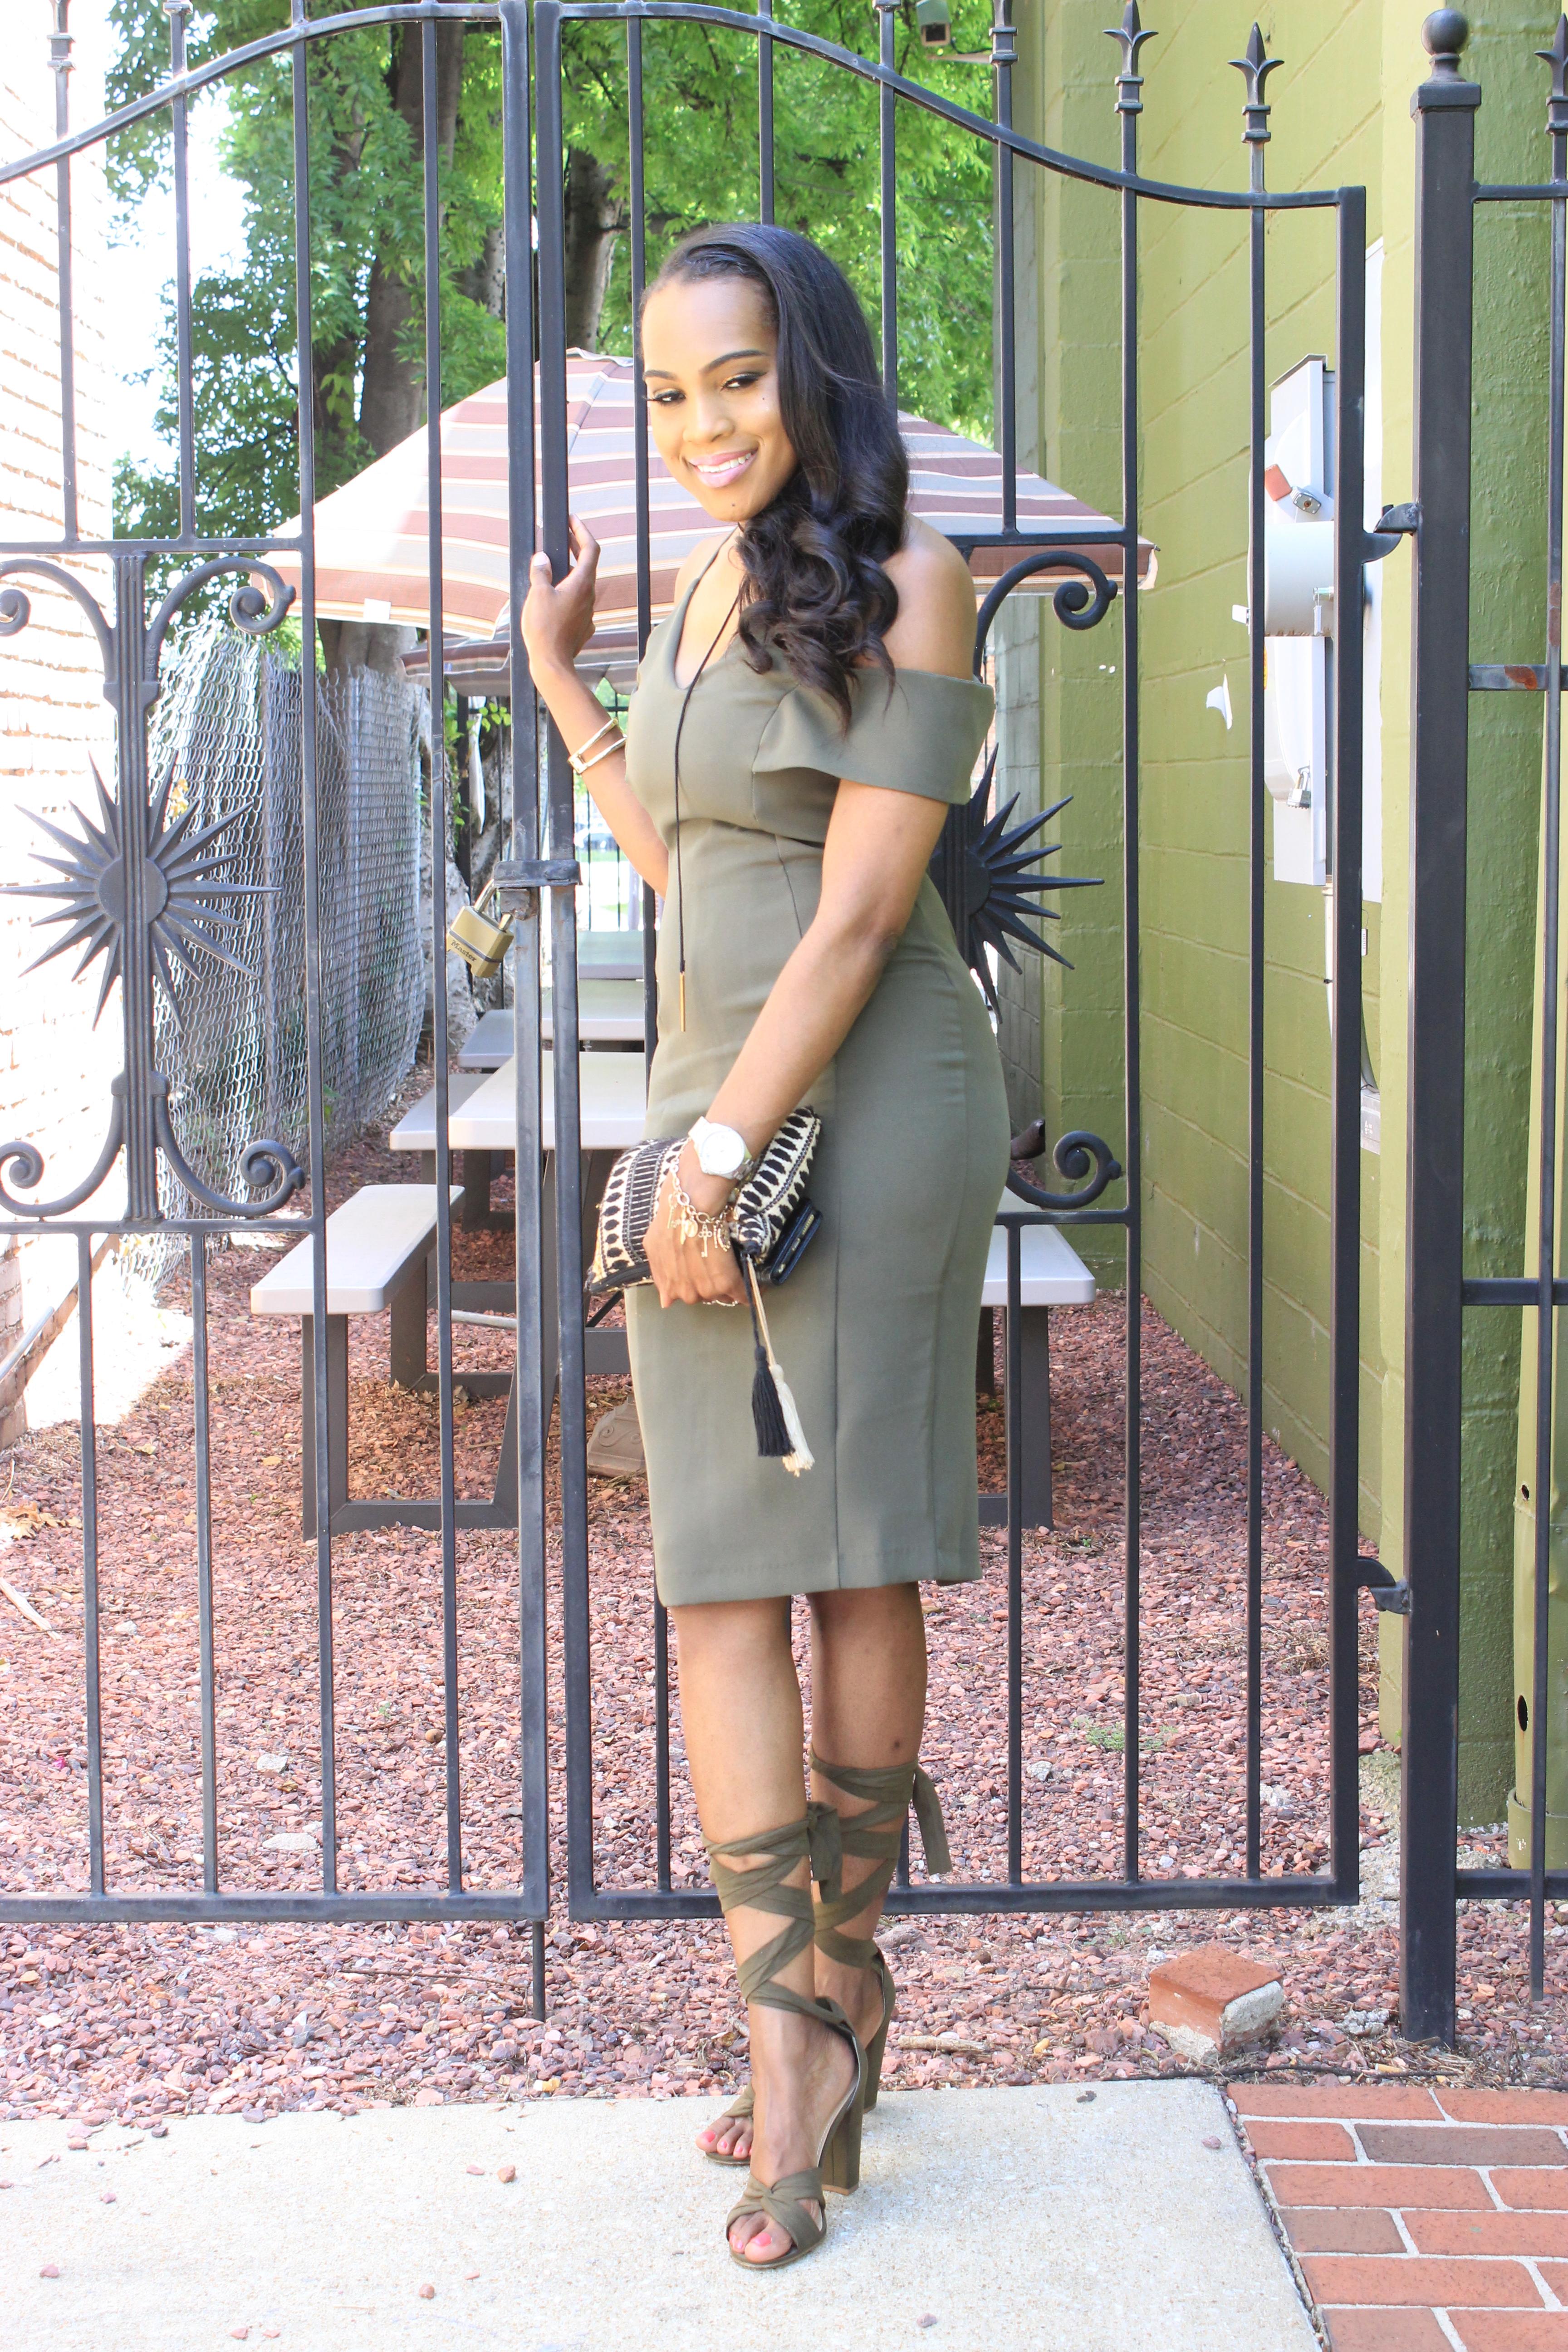 Style-Files-khaki-Vesper Cold-Shoulder-Pencil-Midi-Dress-JustFab-Acacia-Heeled-Sandals-Olive-Green-how to-wear-olive-green-how-to-wear-khaki-oohlalablog-11